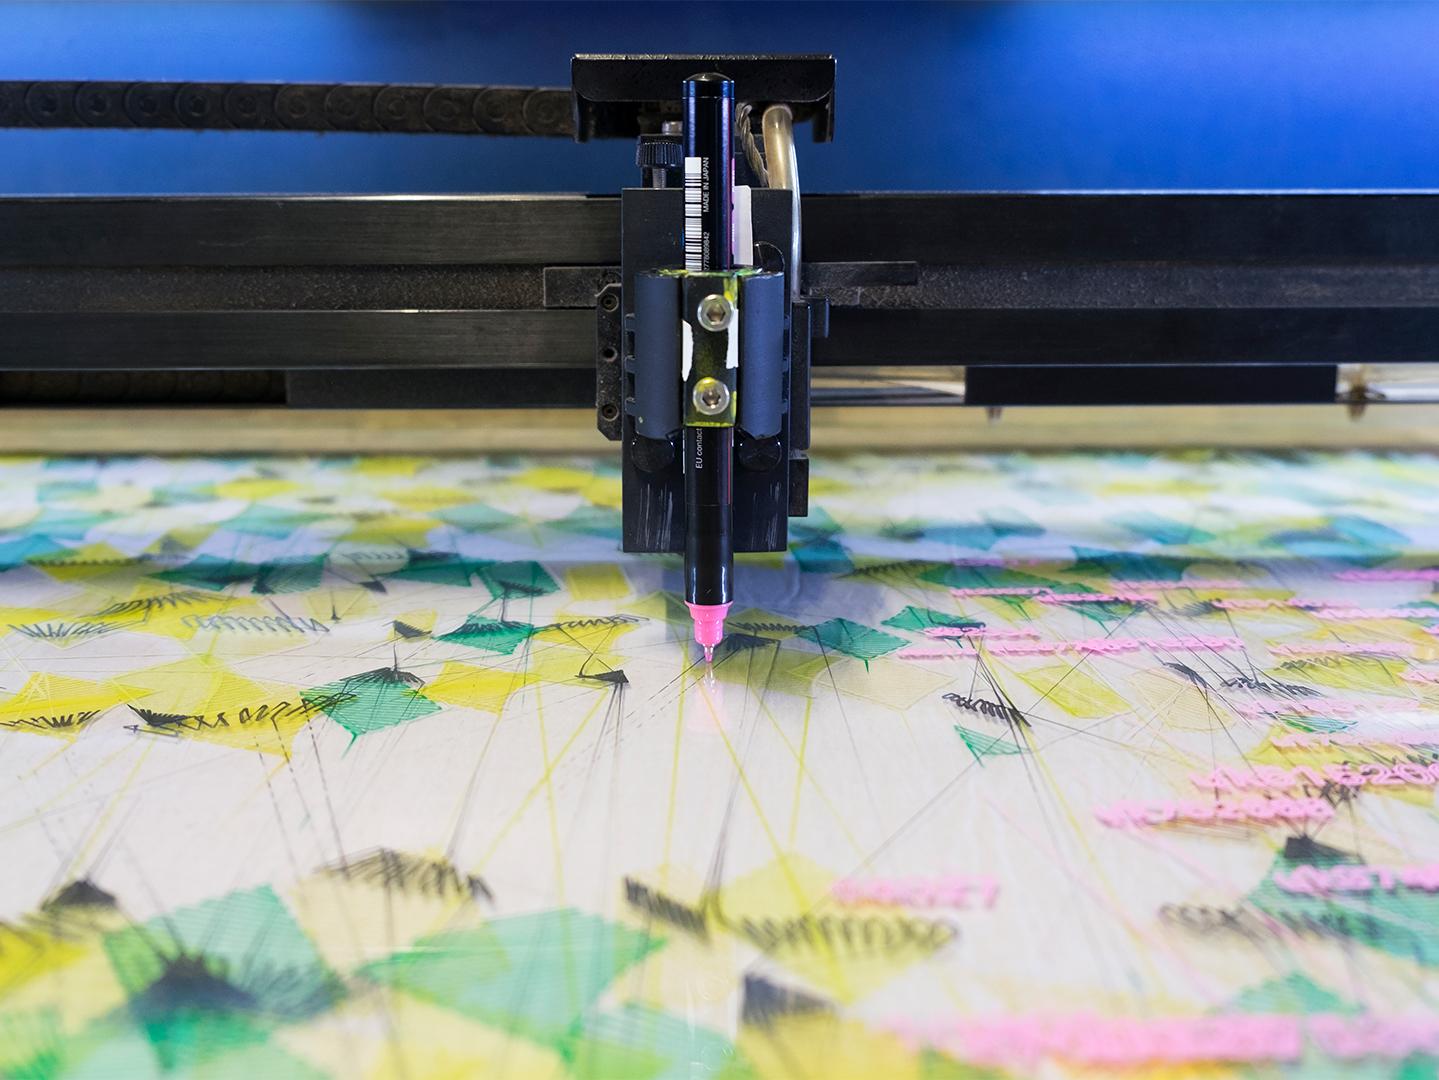 Blick in den Laser des dritten Musters